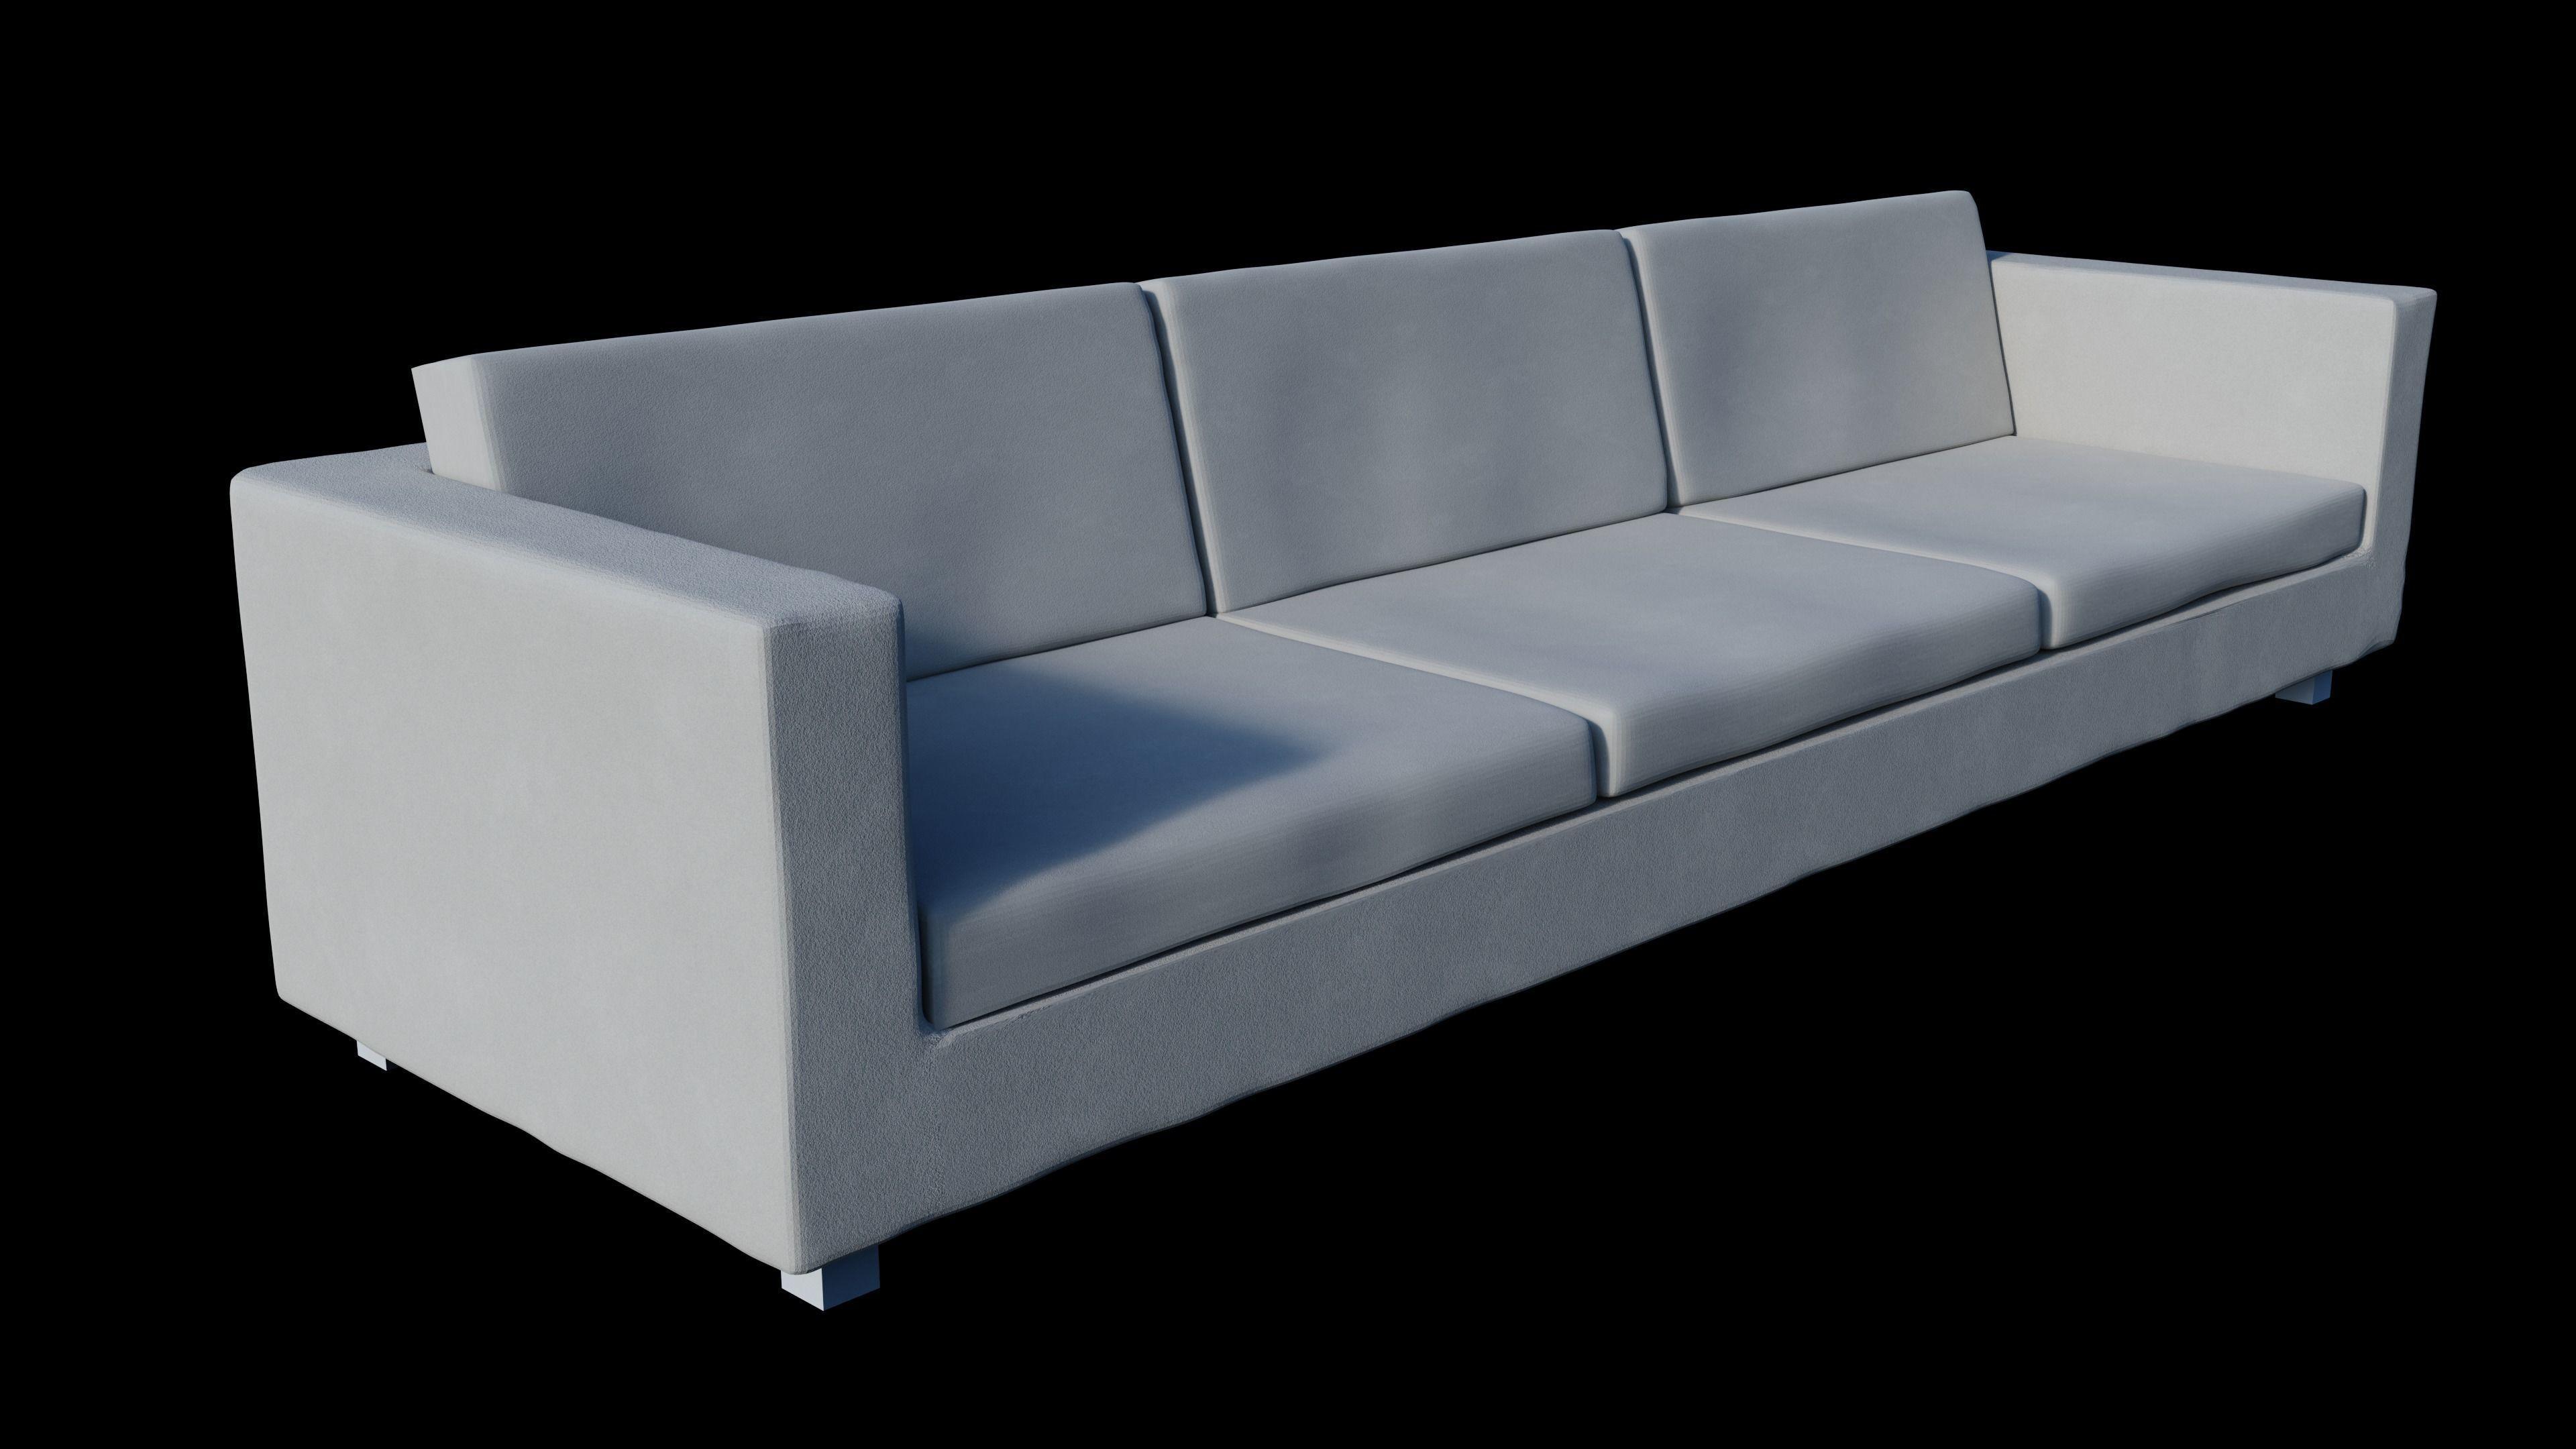 Modern Minimalist Couch Model Obj Mtl 1